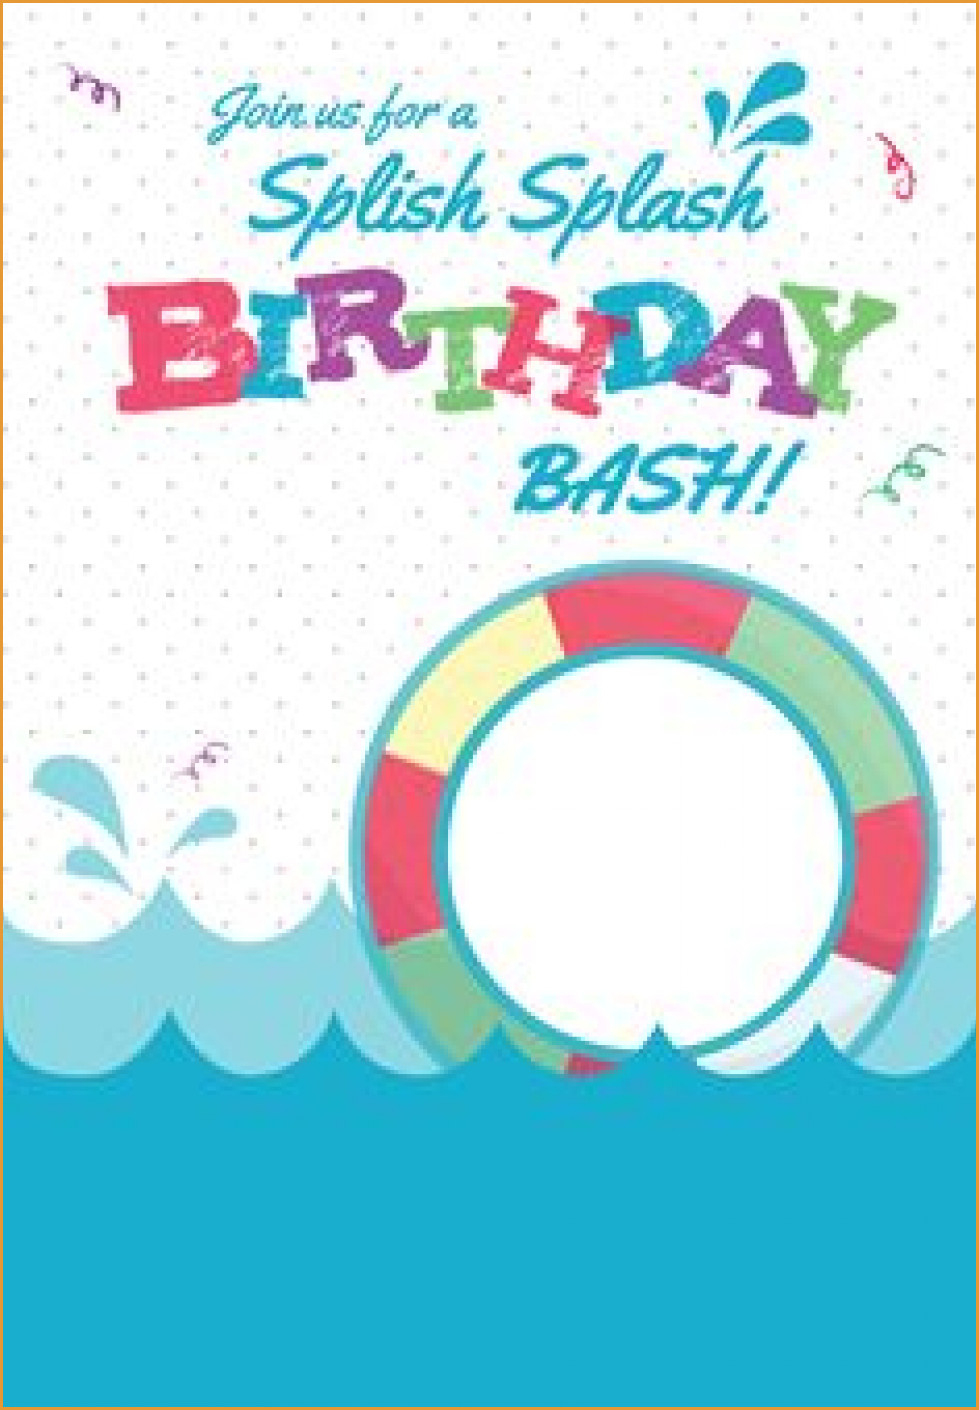 Party Invitations: Latest Free Printable Pool Party Invitations - Free Printable Pool Party Invitations